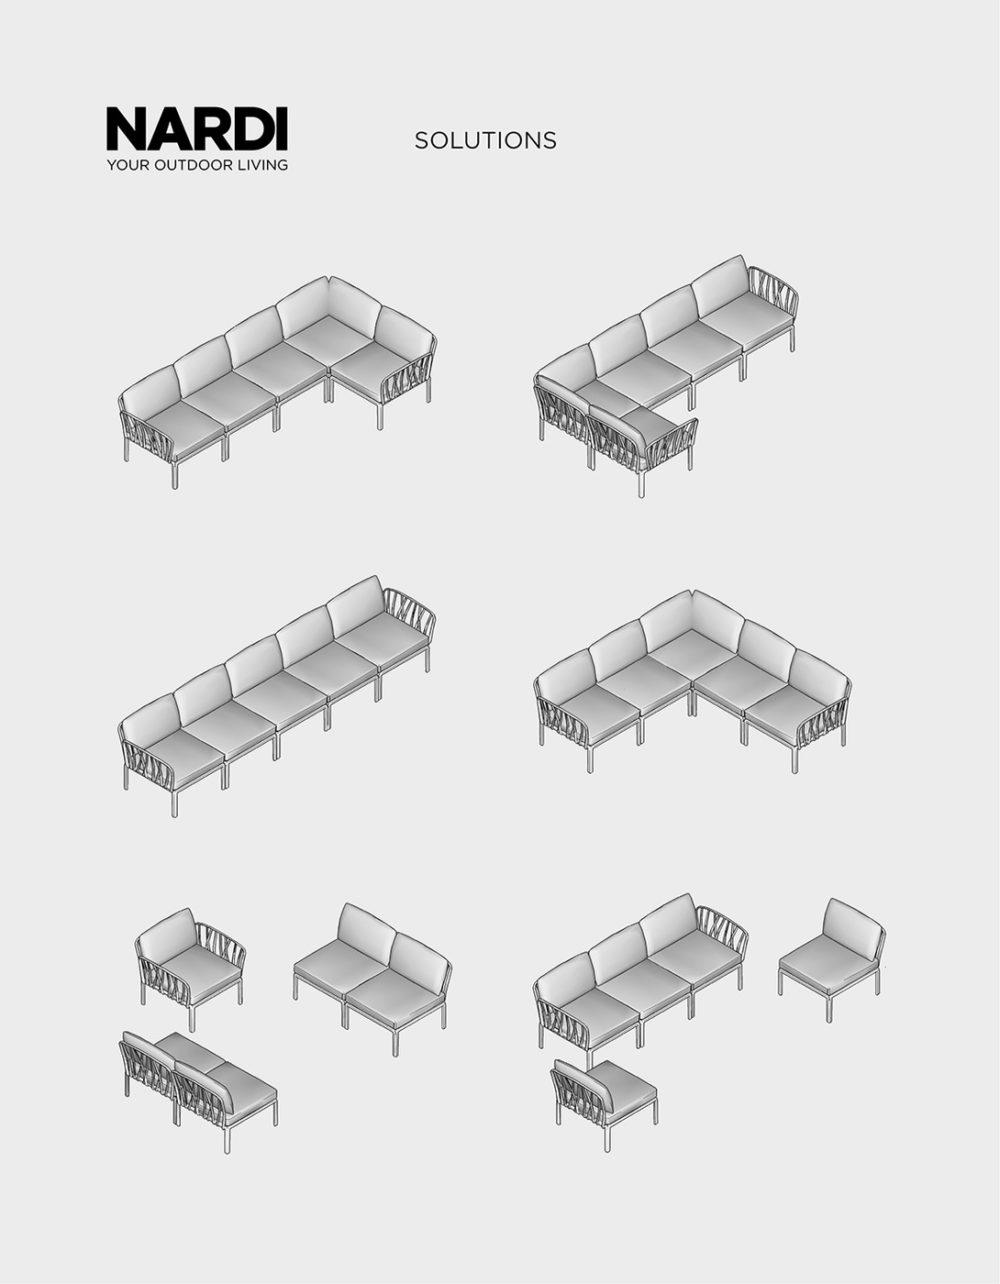 Komodo 5 Modular Outdoor Sofa – Possible Configurations Diagram)